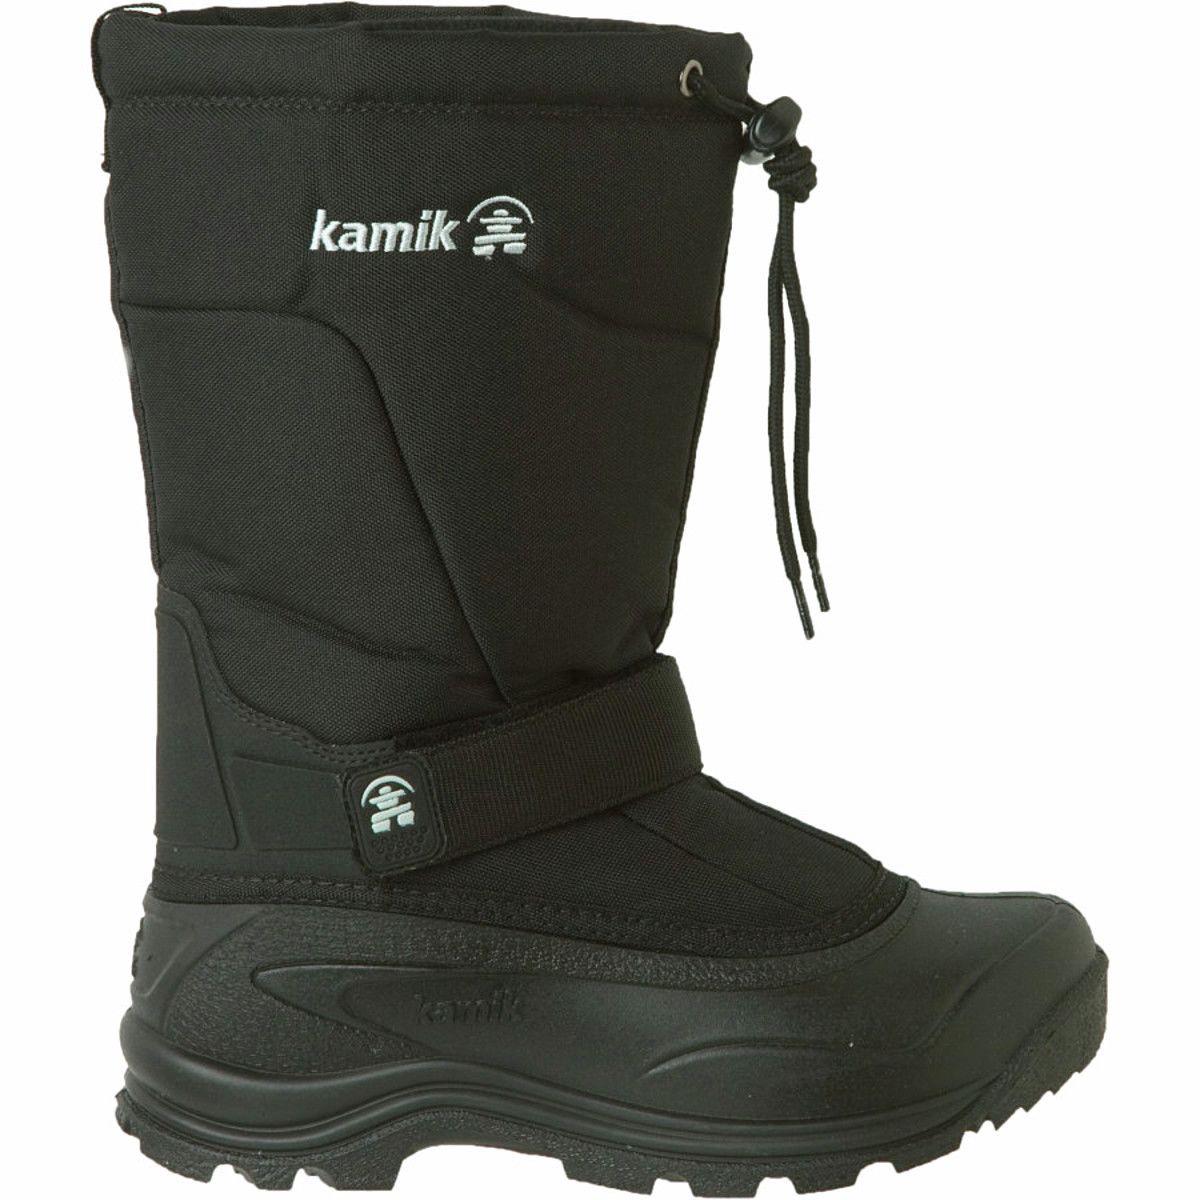 Kamik Greenbay 4 Boot